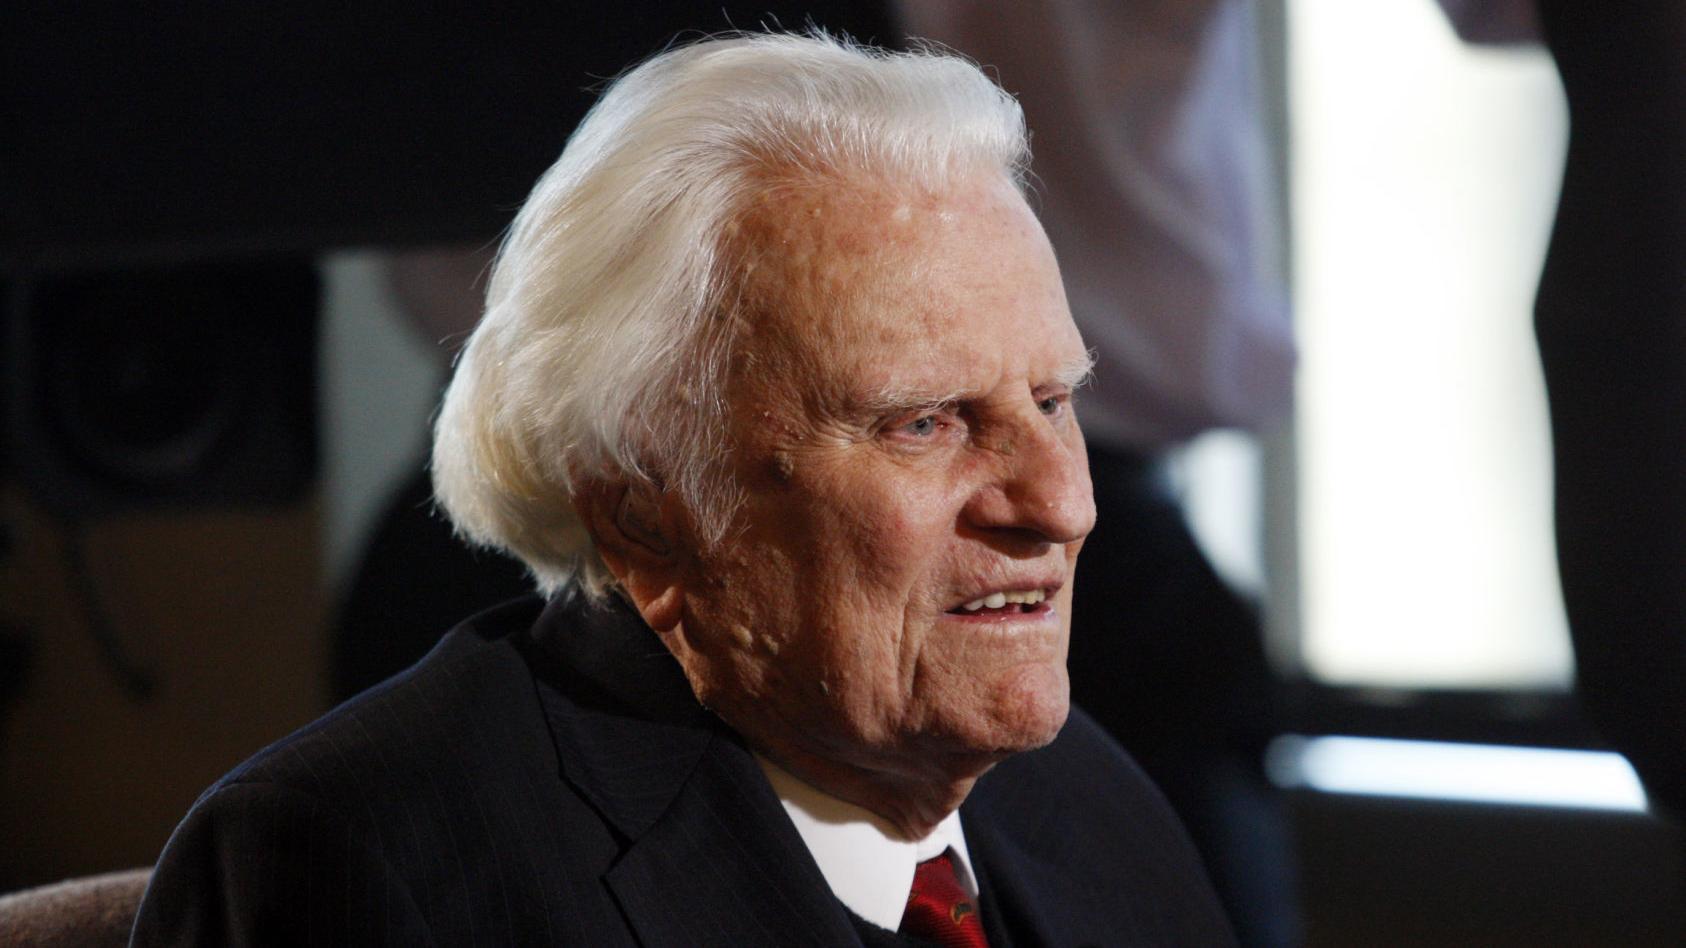 Famed evangelist Billy Graham dies at age 99, spokesman says